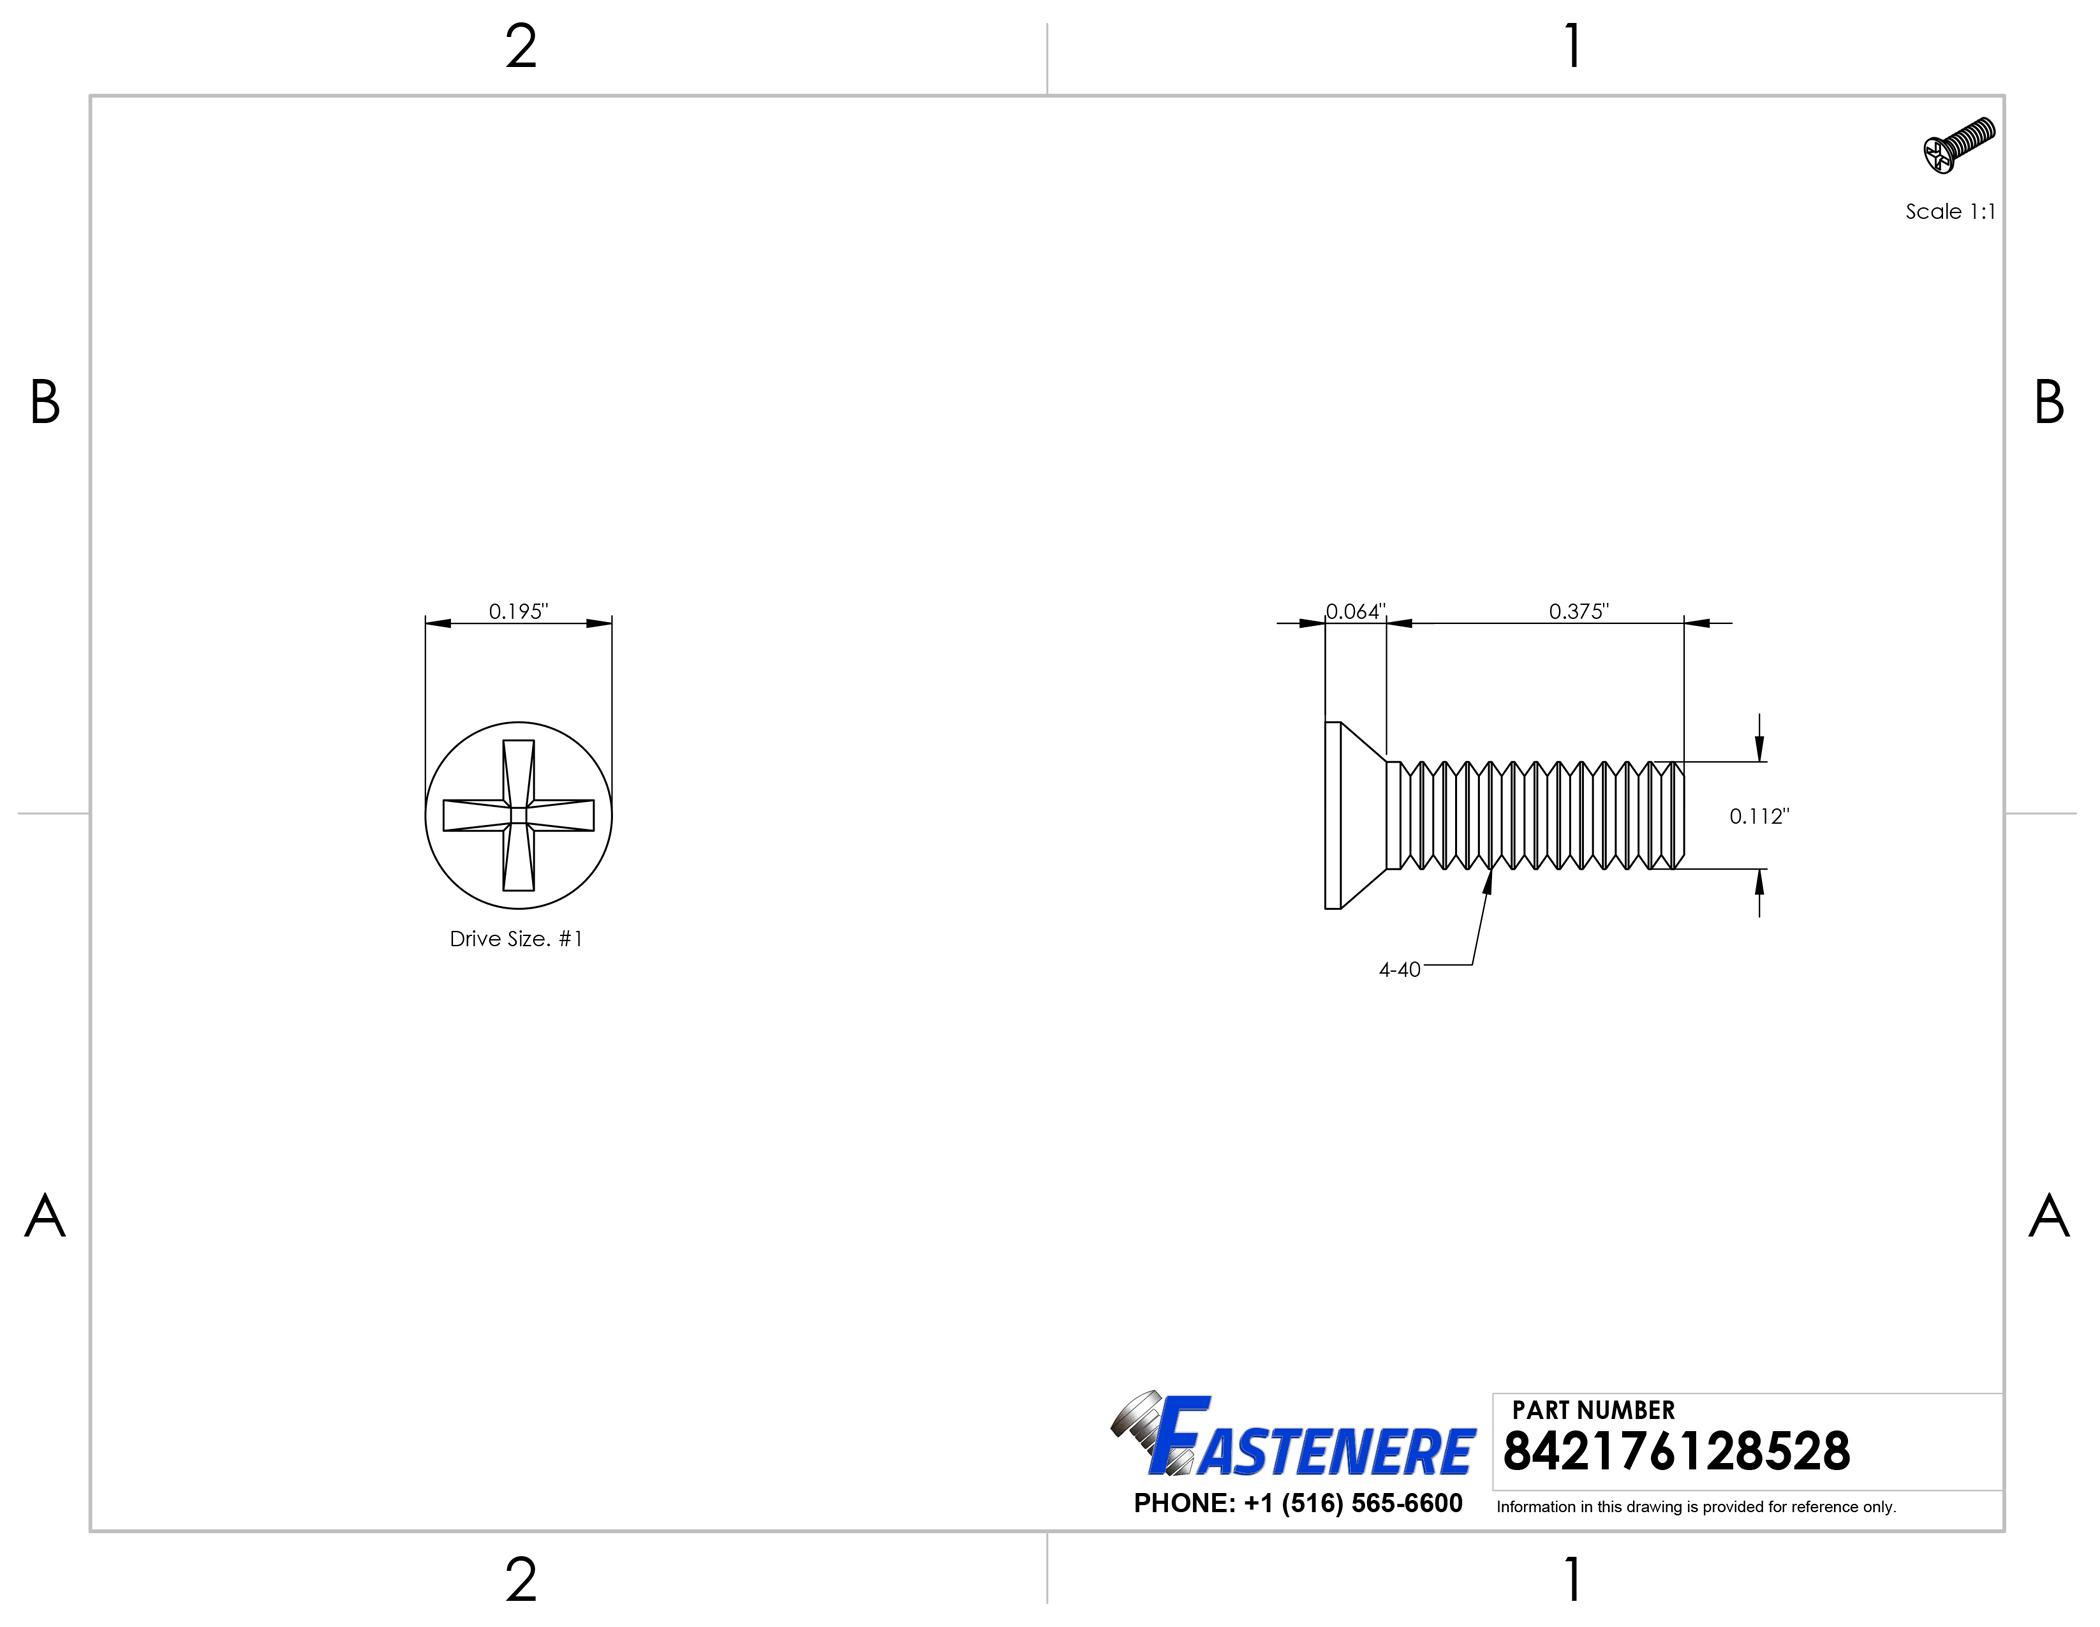 Stainless Steel 18-8 4-40 x 1-3//4 Flat Head Machine Screws Bright Finish Quantity 100 by Fastenere Full Thread Machine Thread Phillips Drive